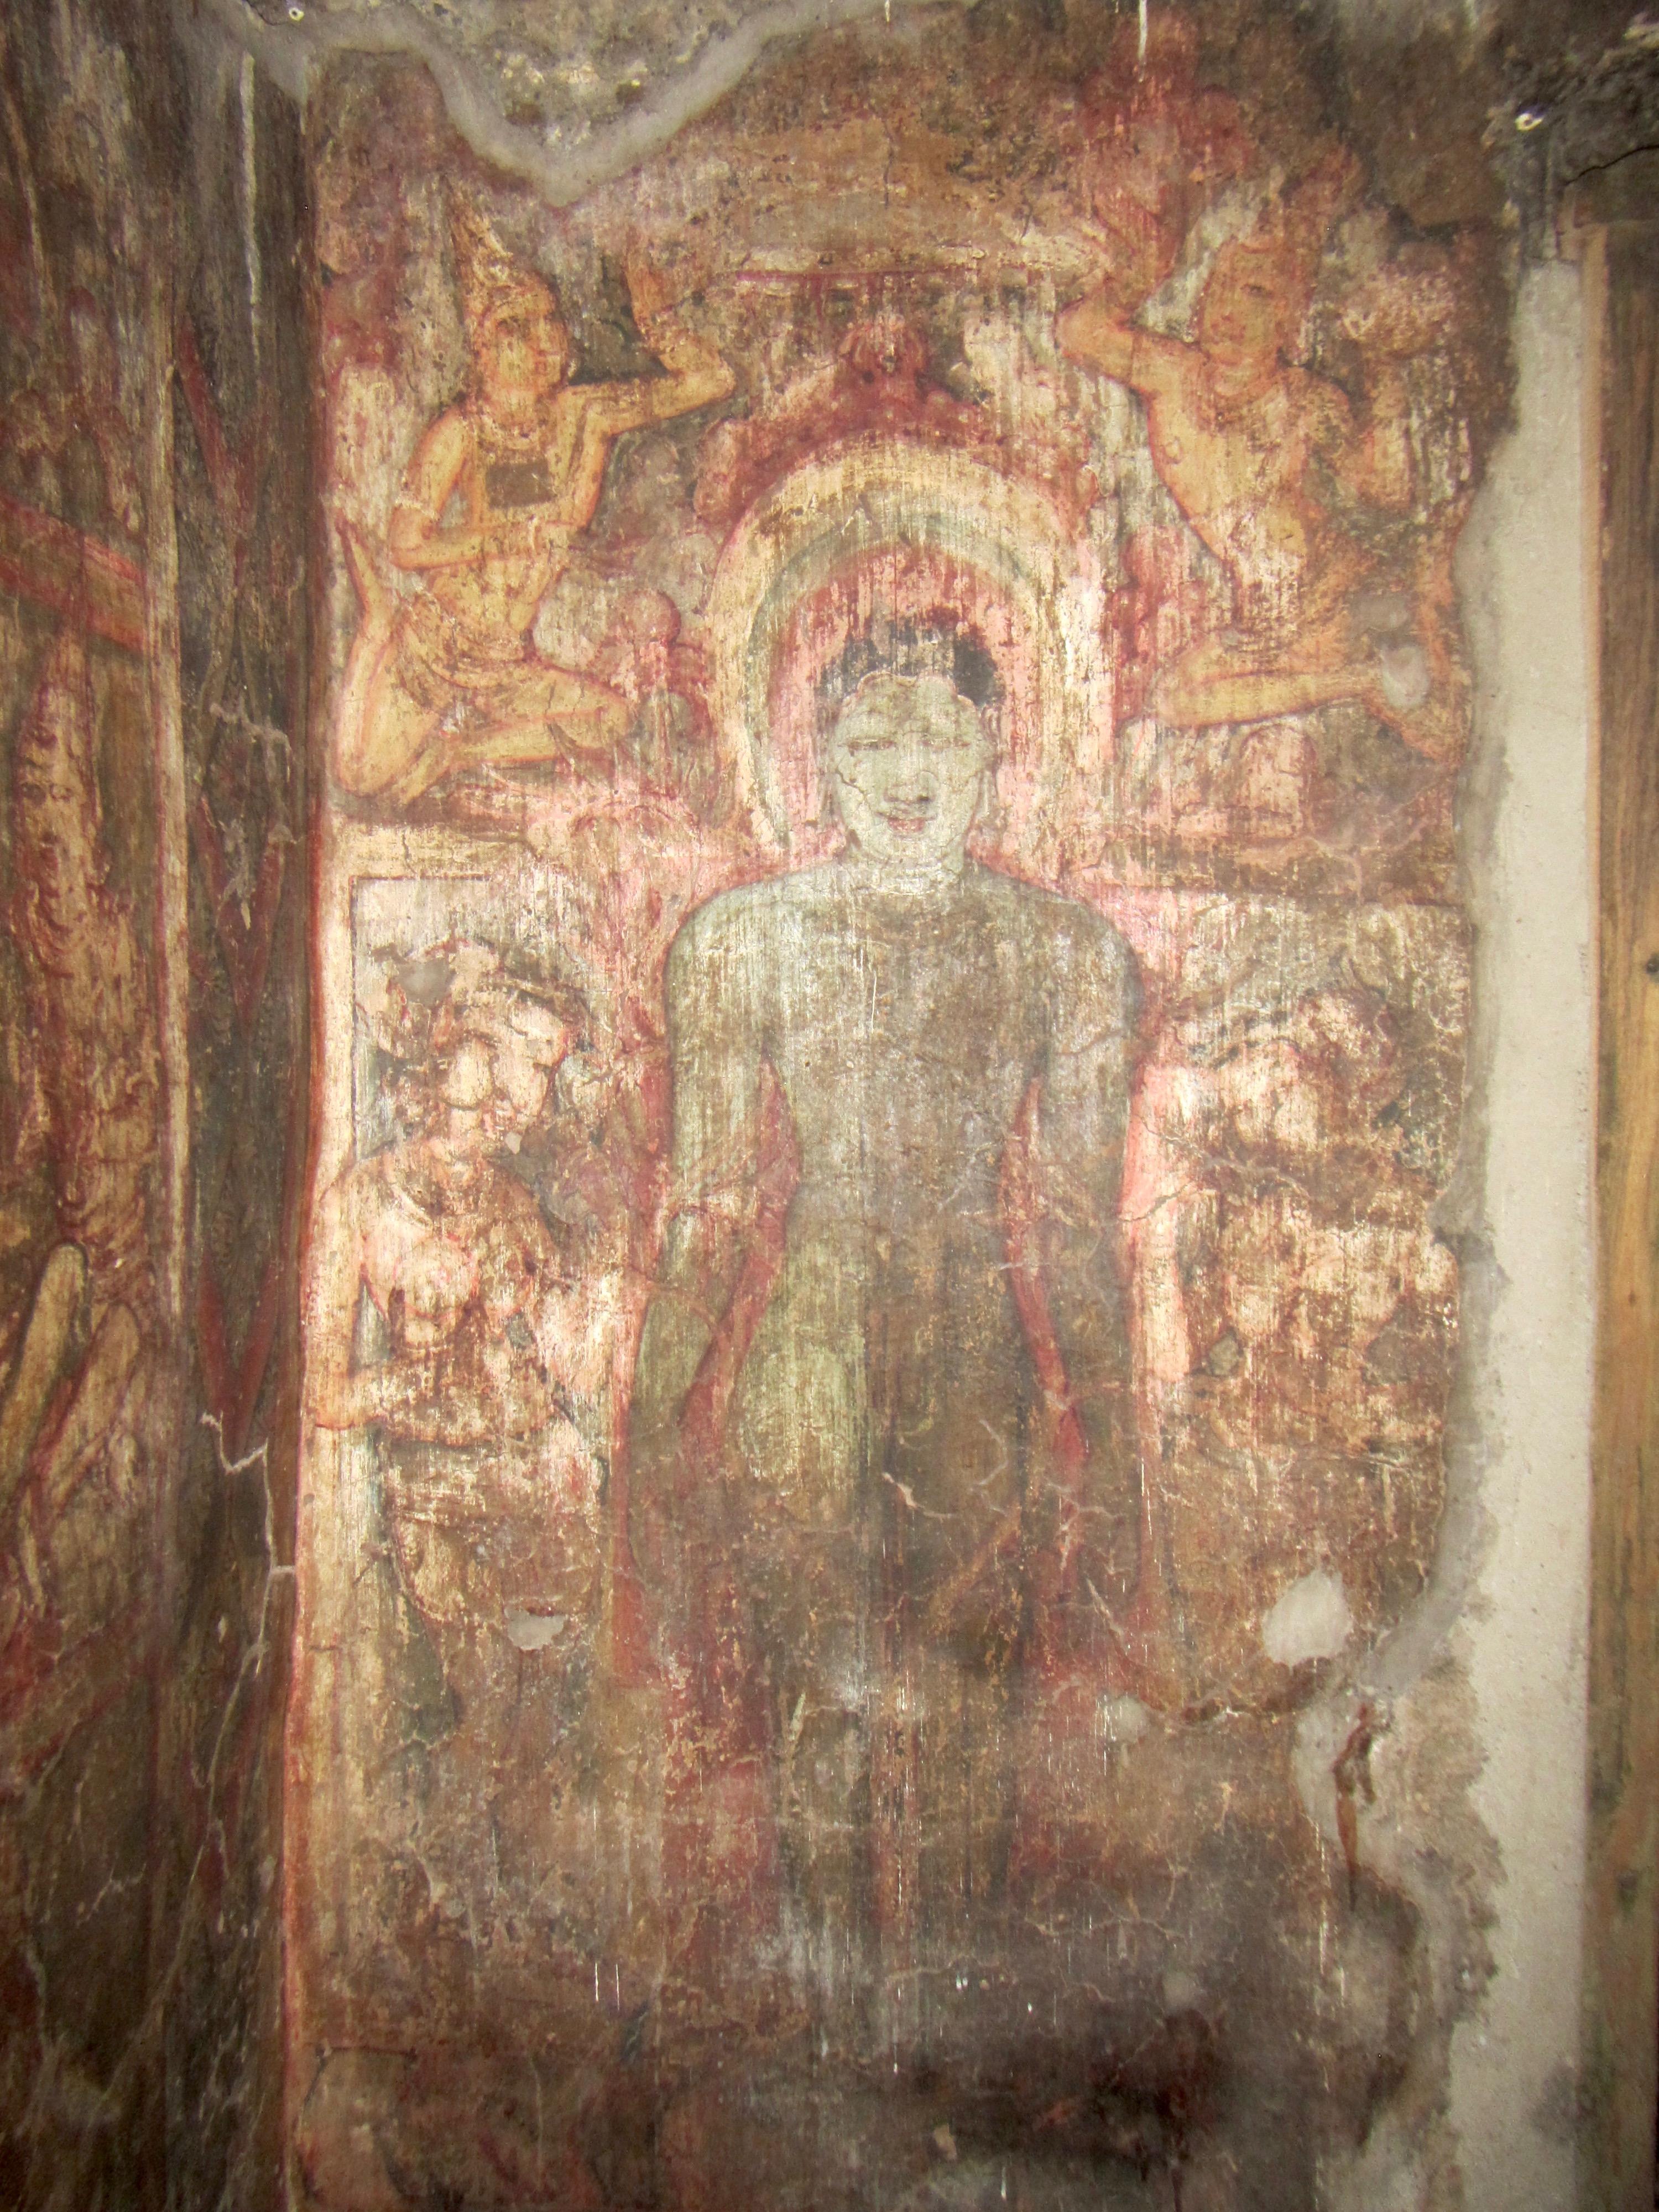 Paintings of Ellora Caves